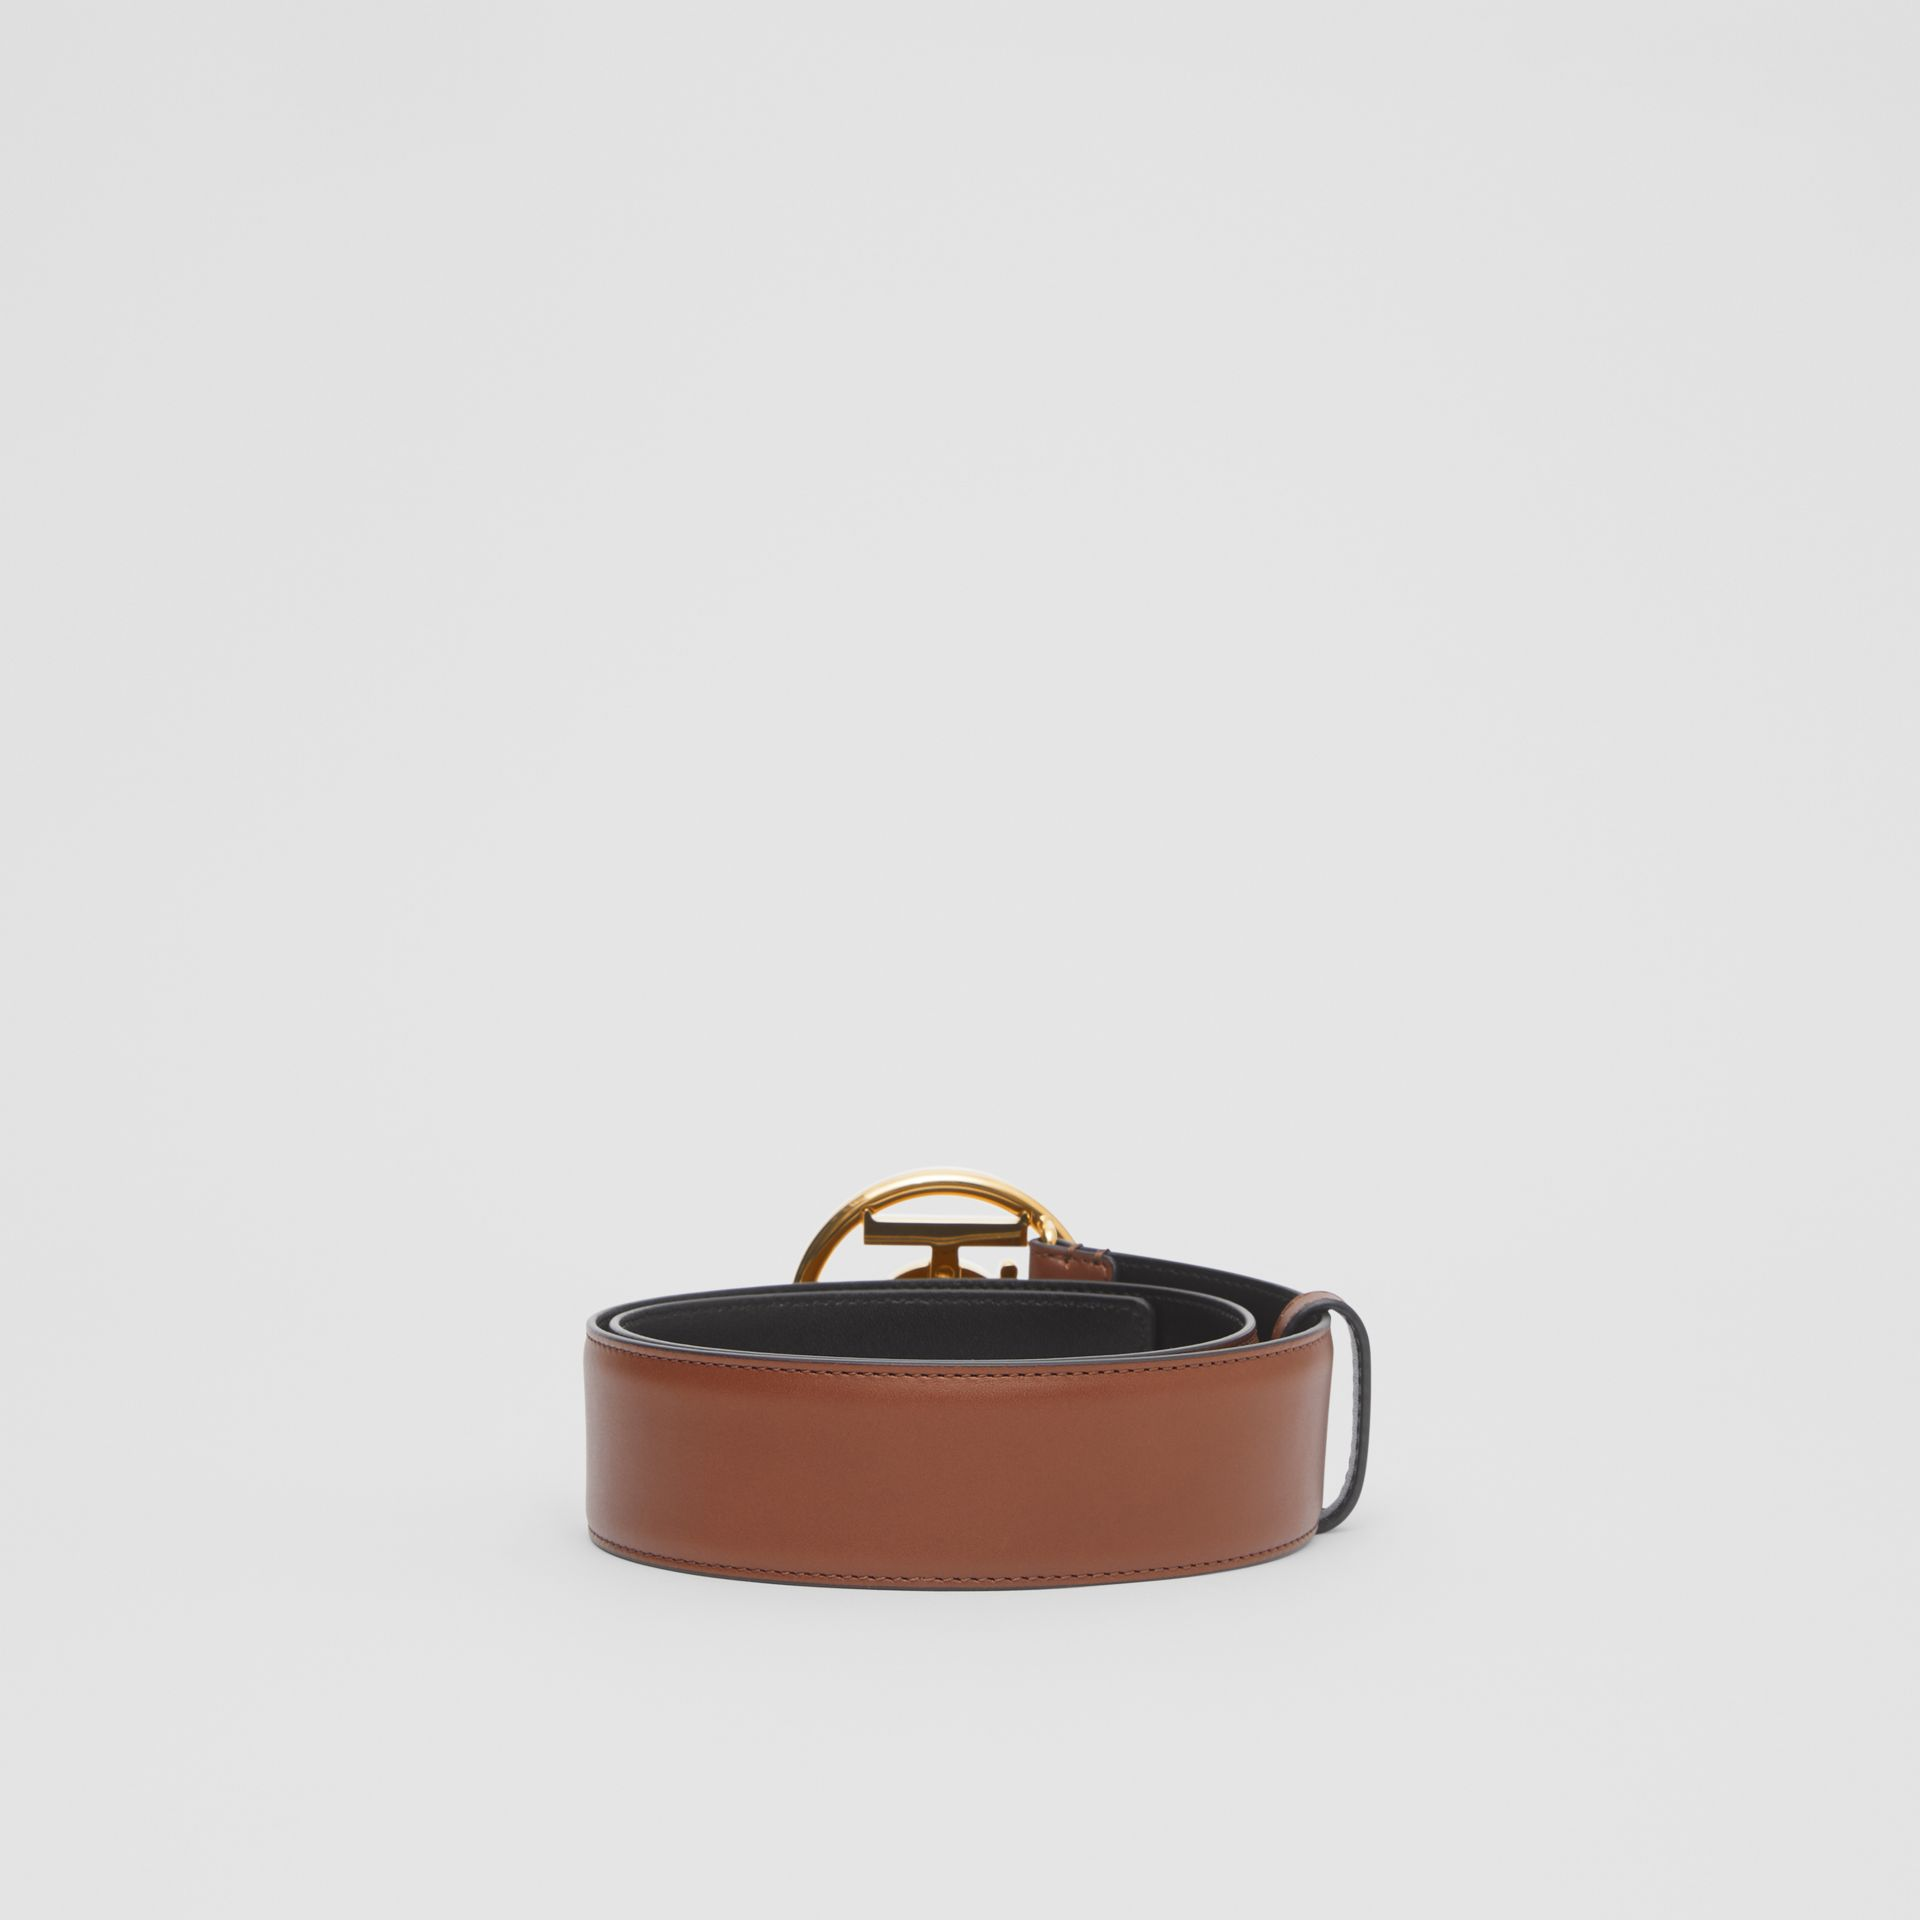 Monogram Motif Leather Belt in Tan/antique Dark Brass - Women | Burberry Canada - gallery image 3